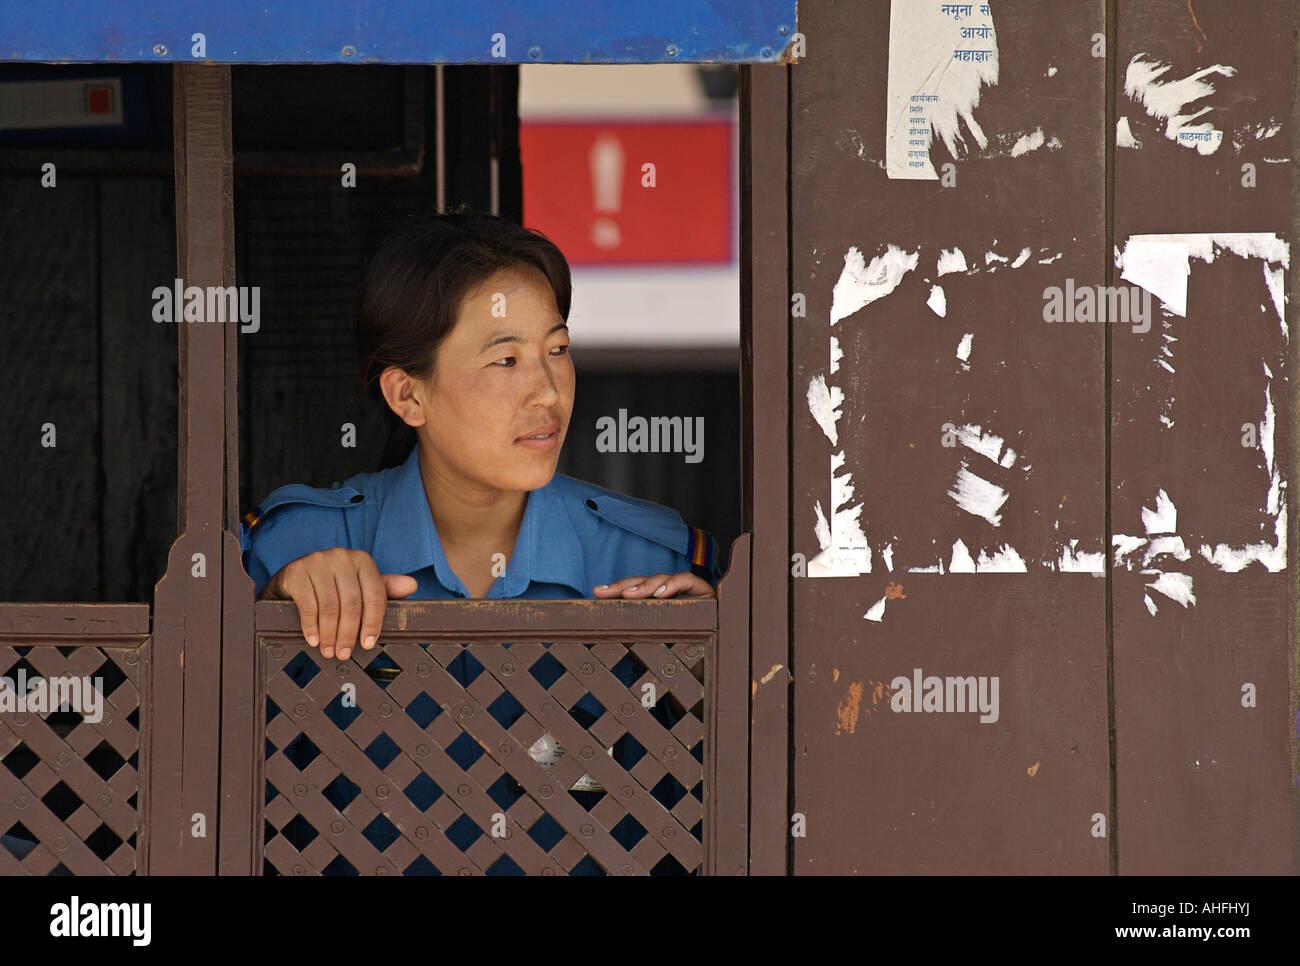 Nepalese police woman at a window Durbar Square Kathmandu Nepal - Stock Image